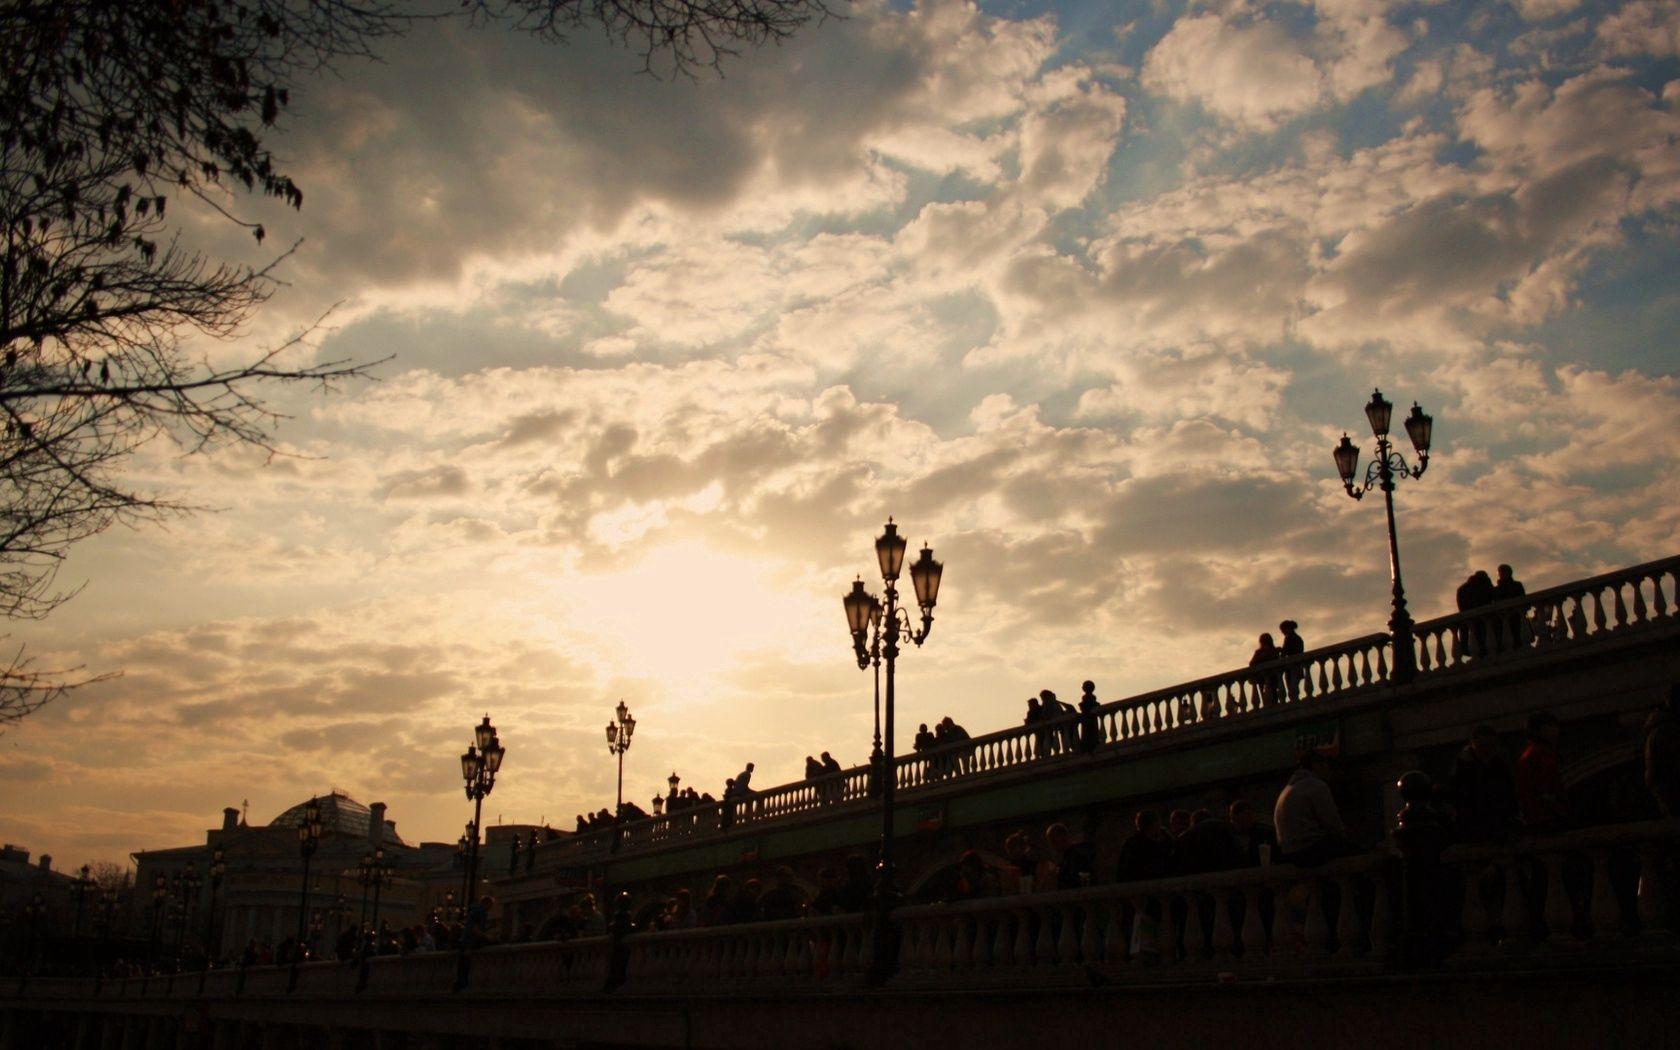 103106 скачать обои Москва, Мост, Фонари, Закат, Города - заставки и картинки бесплатно